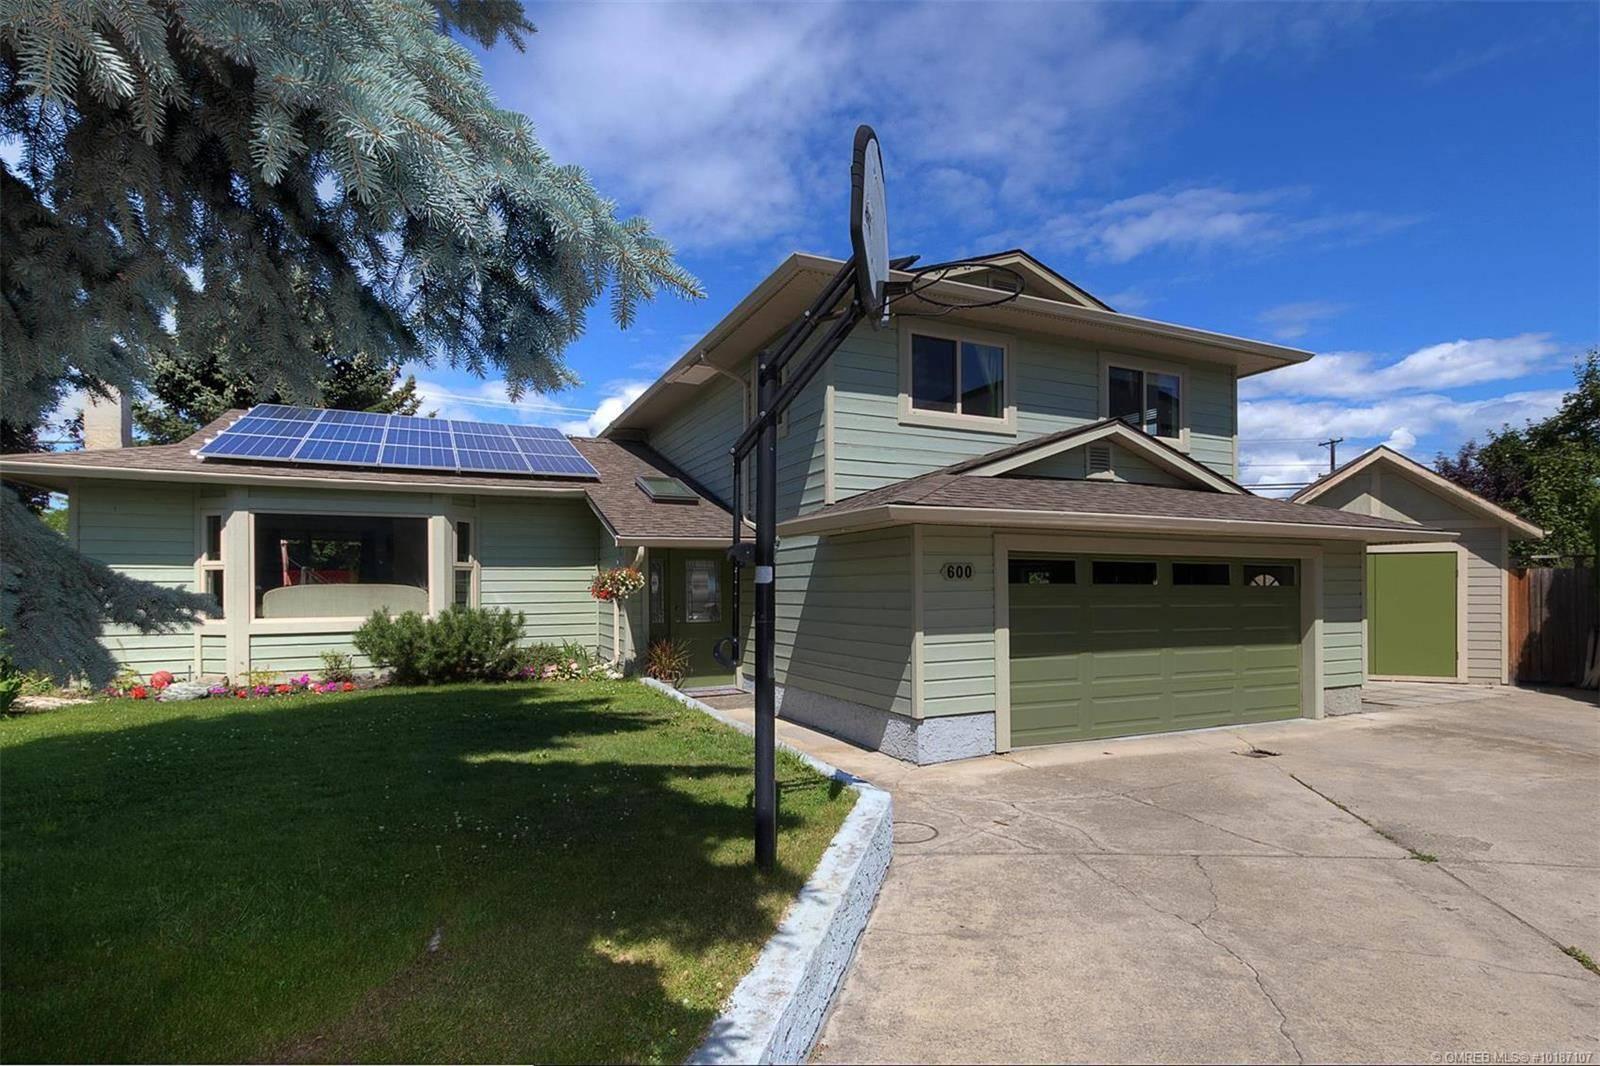 House for sale at 600 Welke Rd Kelowna British Columbia - MLS: 10187107